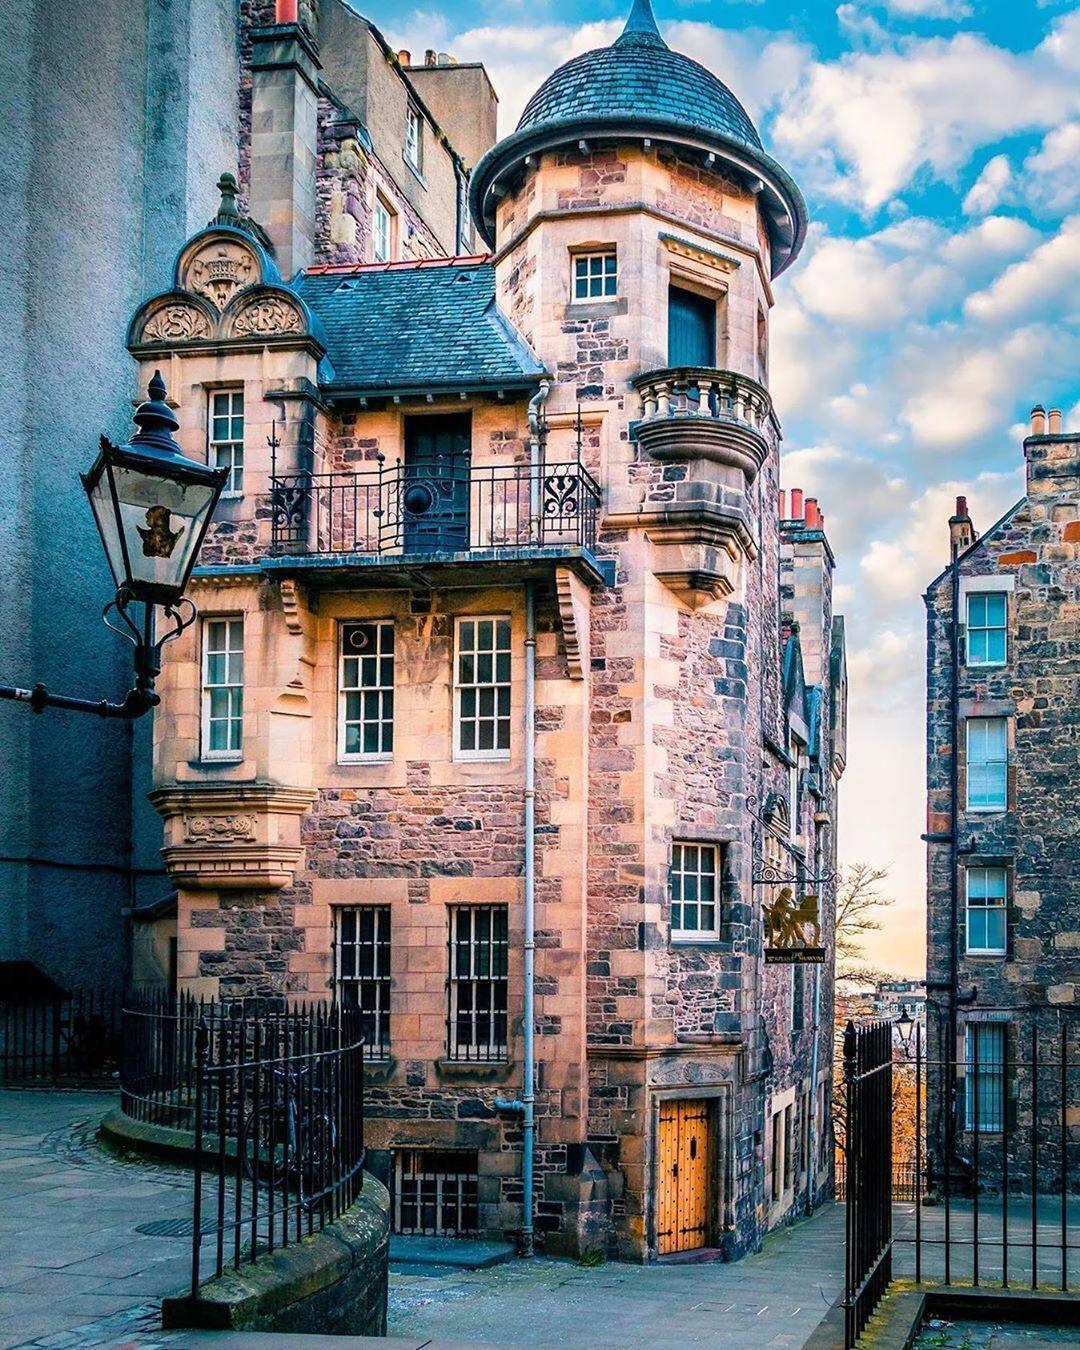 Writers' Museum on Lady Stair's Close #kings_villages #storiesfromscotland #photosofbritain #igersedinburgh #scotland_insta #scotlandlover #scotlandscenery #lovegreatbritain #manor_n_castle #thisisedinburgh #topukphoto #writersmuseum #uk_greatshots #ilovescotland #architecturedesign #hello_worldpics #ig_edinburgh #mycanonstory #scotlandexplore #ukshots #tlpicks #visitscotland #thisisscotland #scotlandisnow